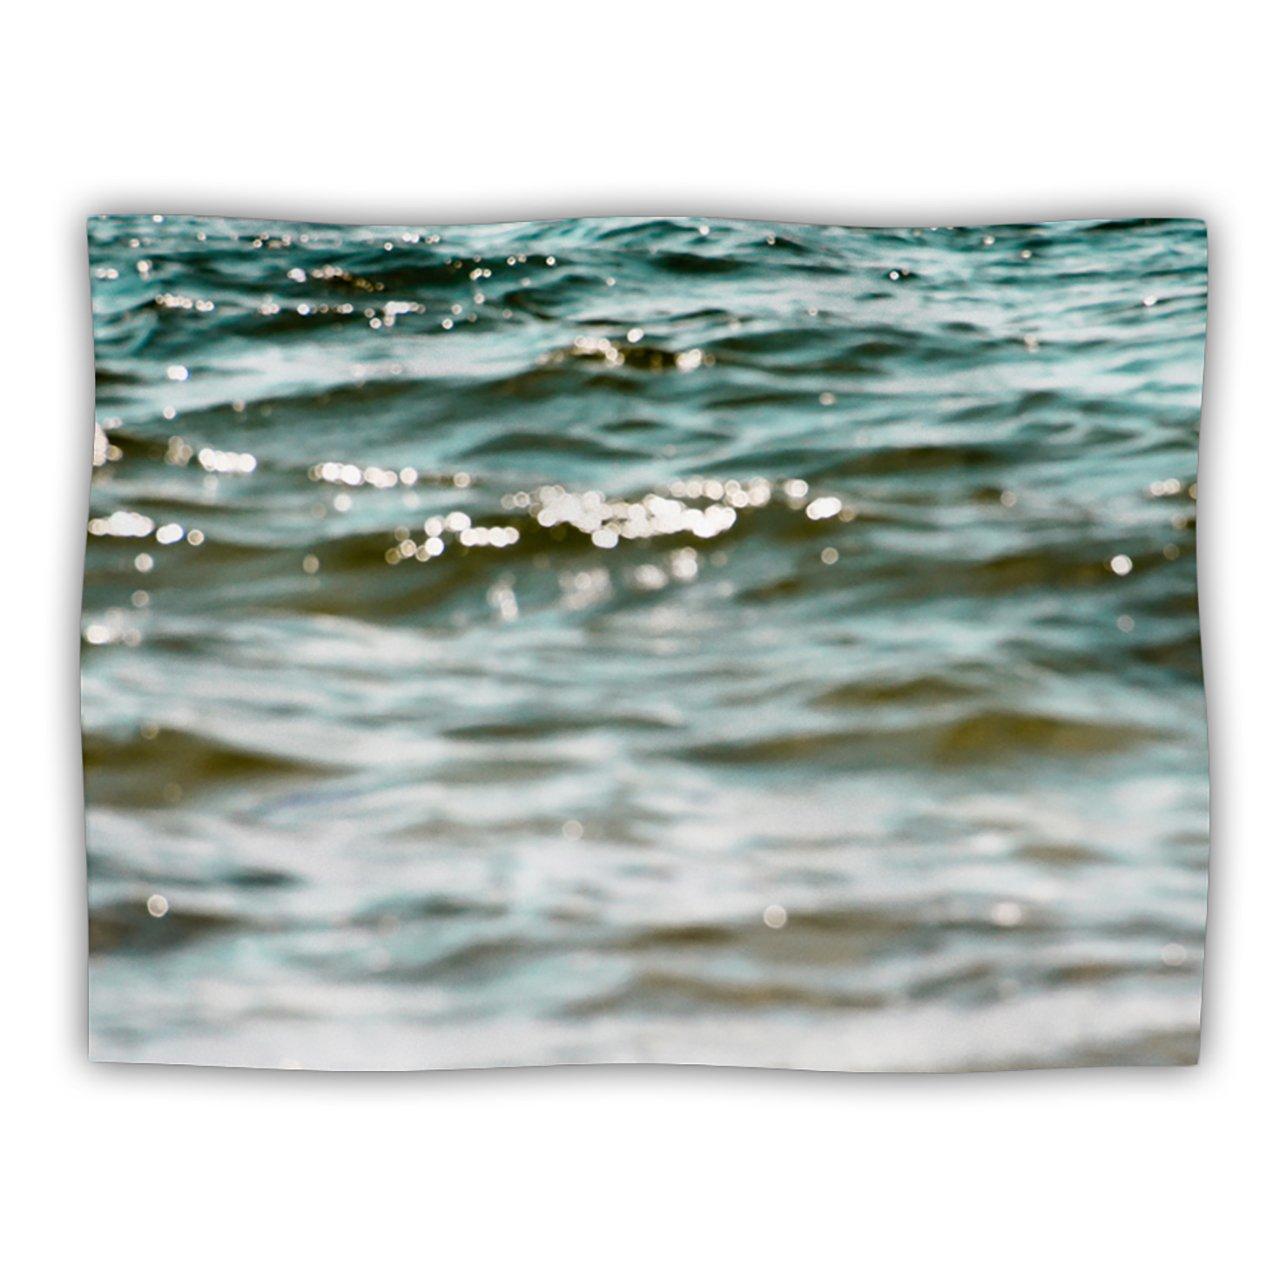 KESS InHouse Debbra Obertanec Turquoise Blue Green Water Pet Blanket, 40 by 30-Inch by KESS InHouse